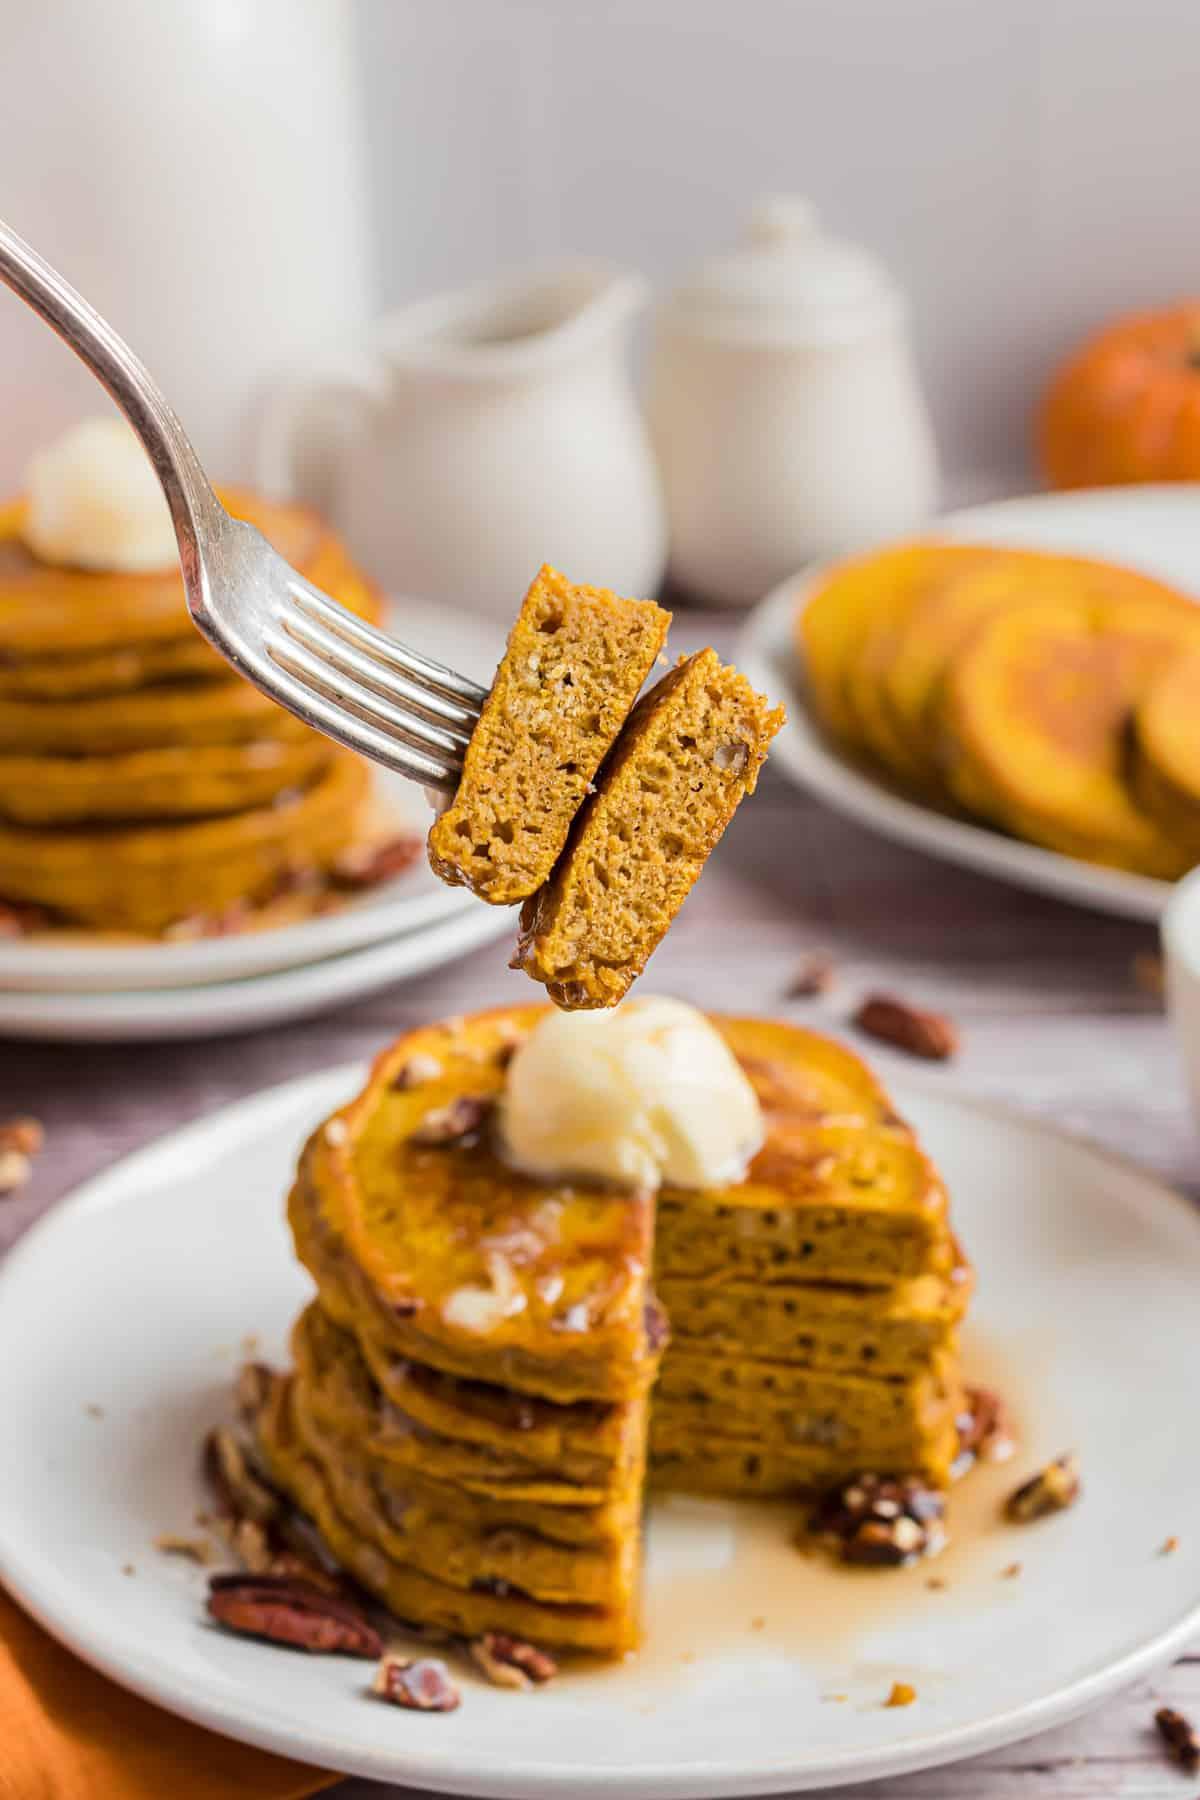 Pancake wedges on a fork.